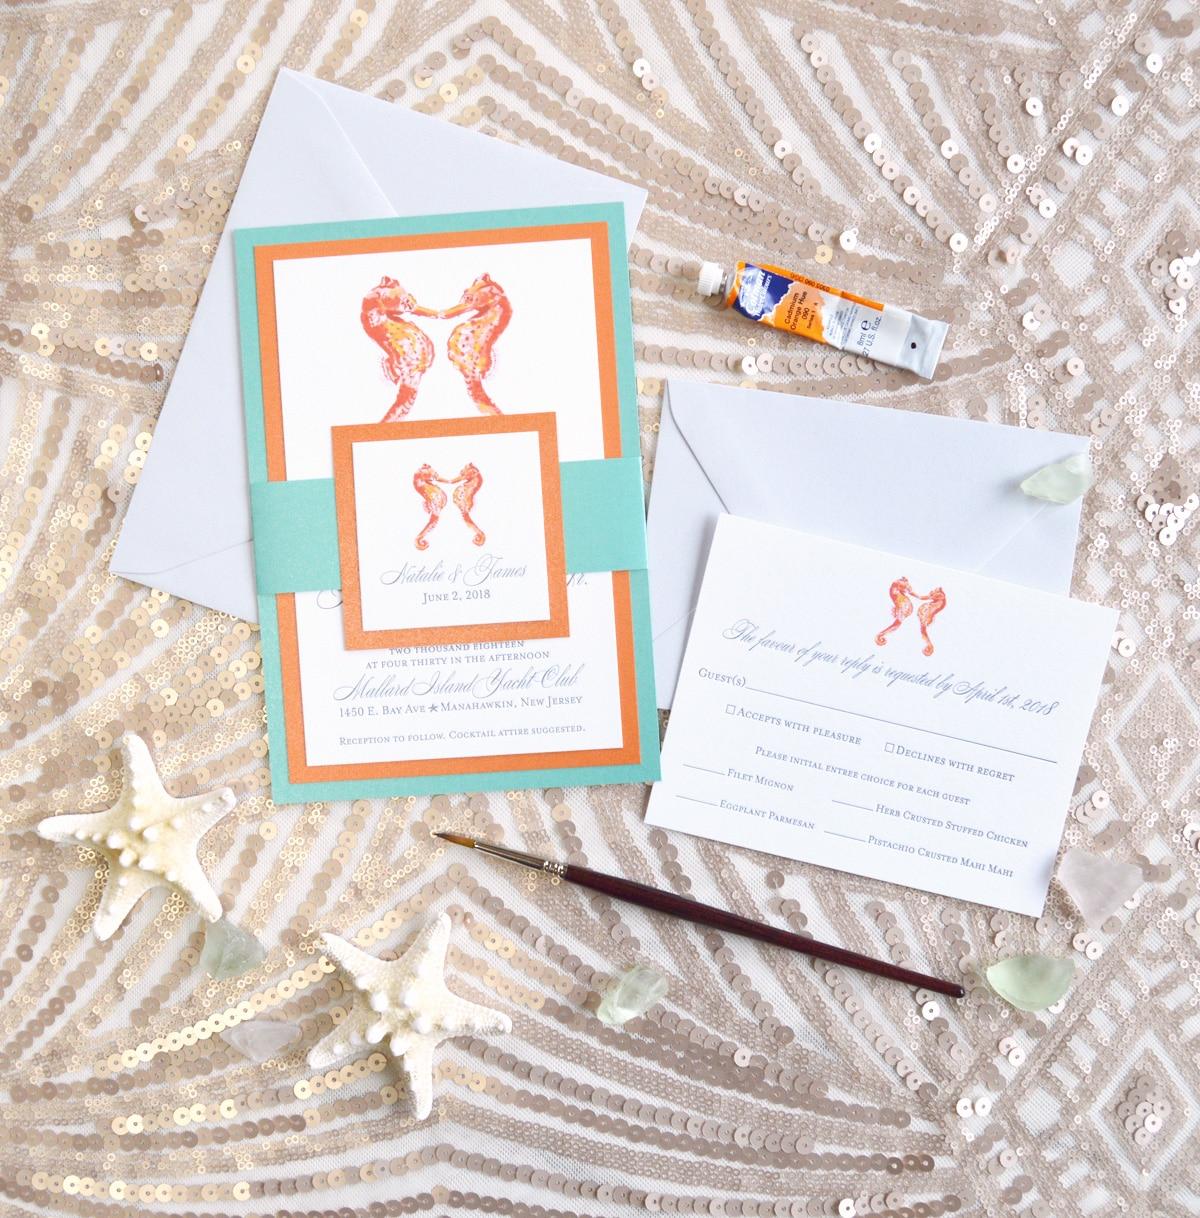 Supple Letterpress Beach Wedding Invitations By Artistmichelle Mospens Studio Custom Letterpress Invitations Letterpress Wedding Watercolor Seahorses wedding invitation Letterpress Wedding Invitations